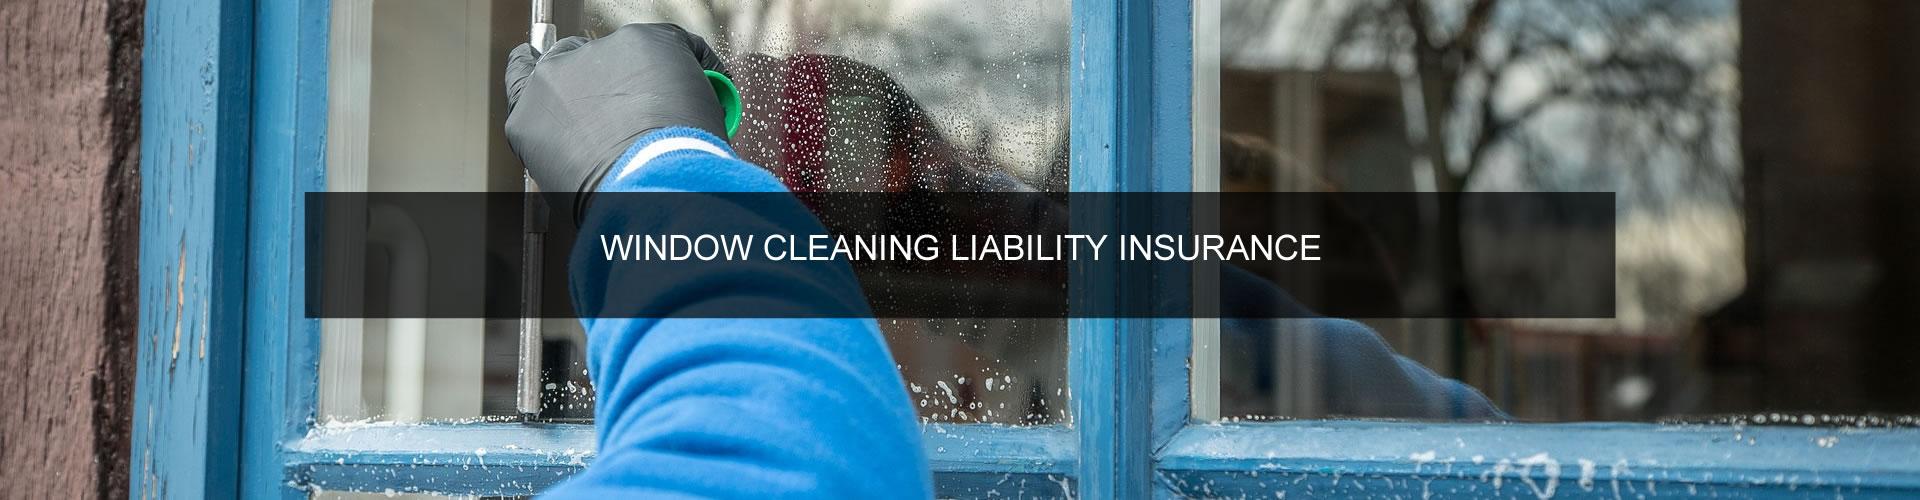 Window Cleaners Liability Insurance